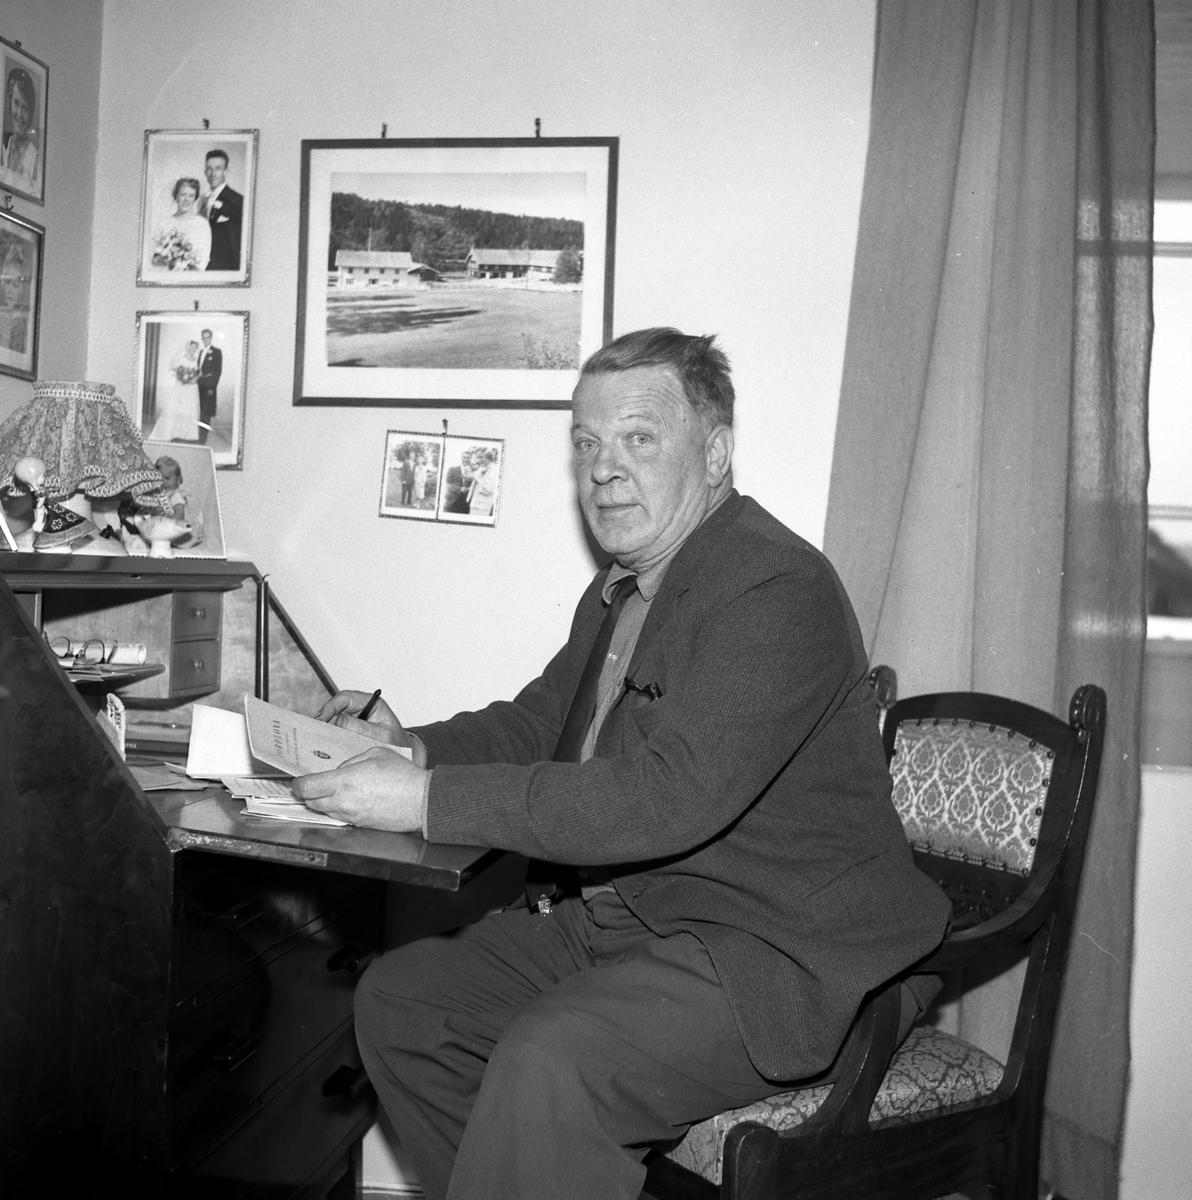 Einar Gjems